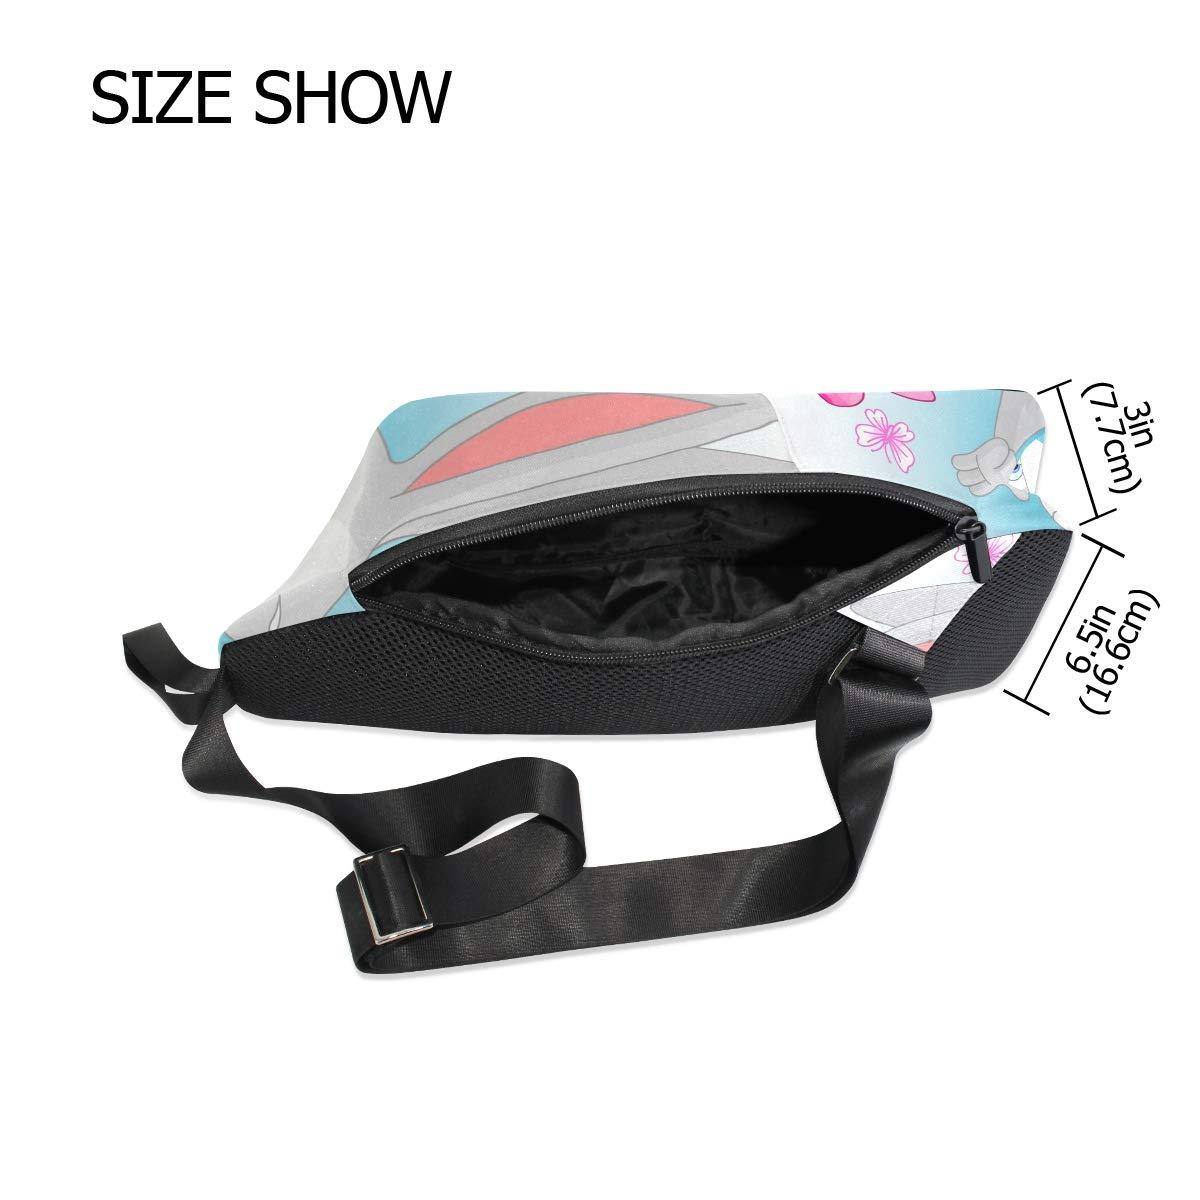 Unisex Messenger Bag Happy Easter Bunny Rabbit Insect Shoulder Chest Cross Body Backpack Bag